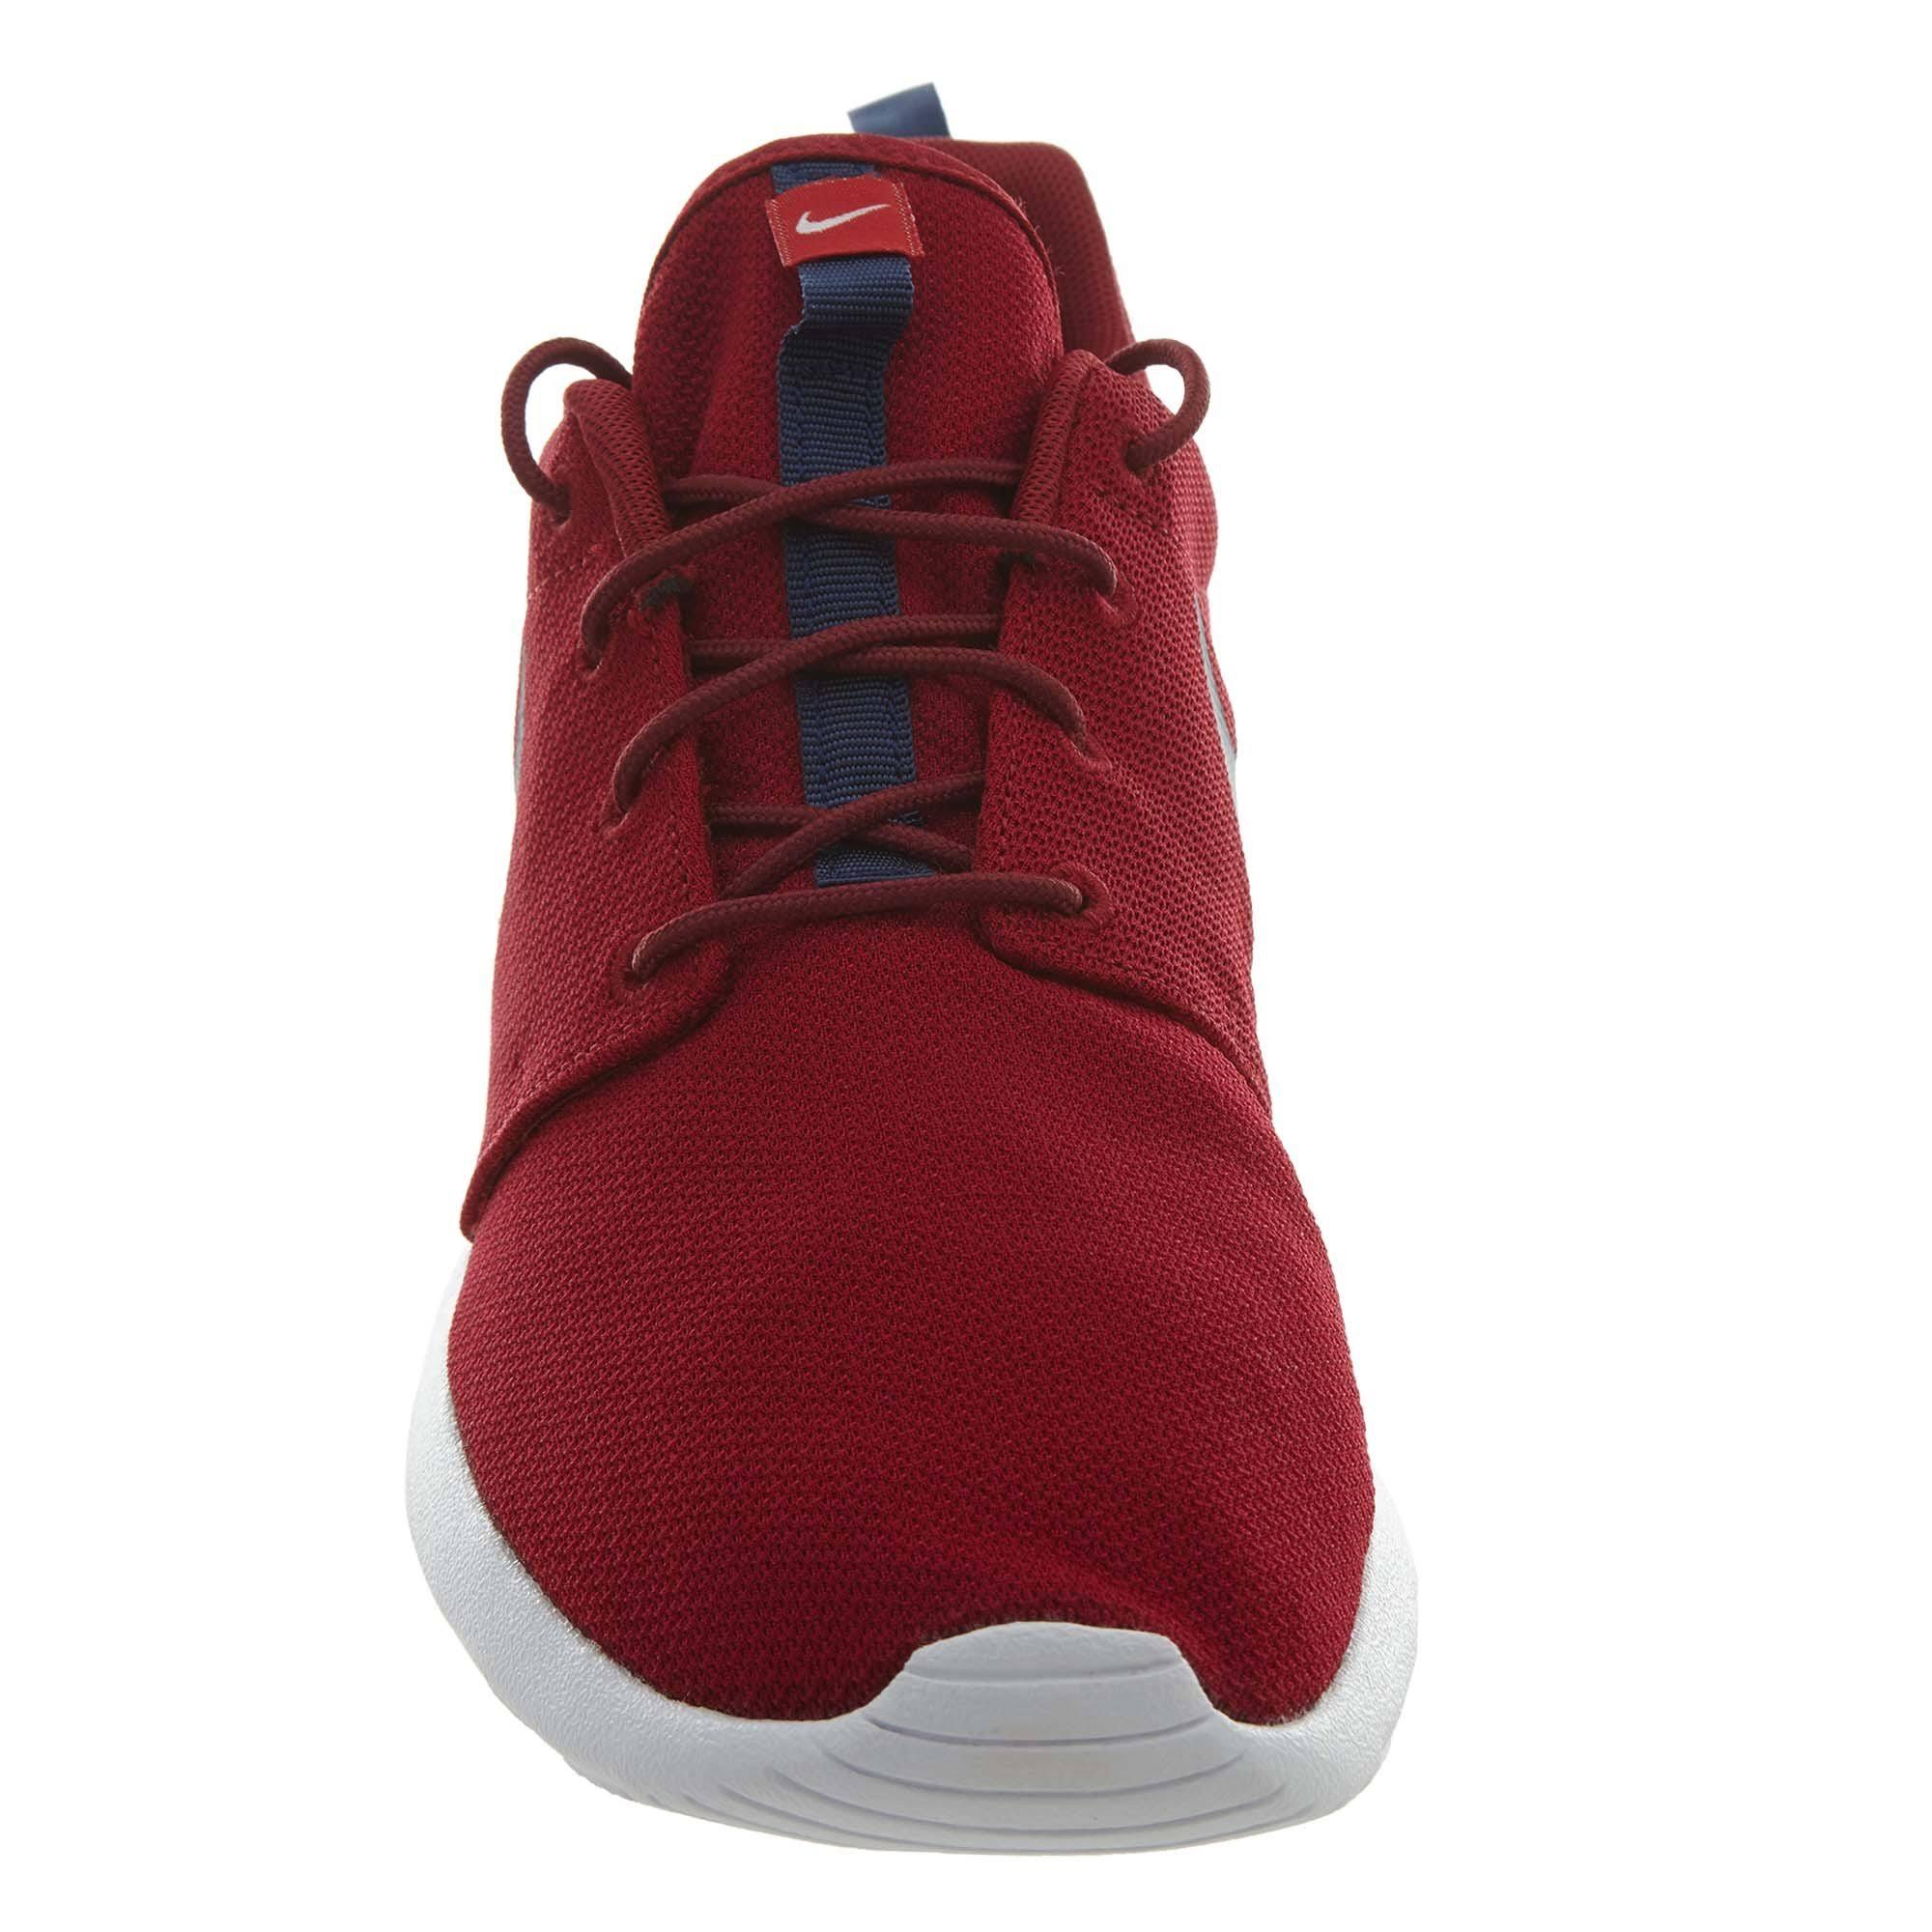 Mens 511881 Style Nike Midnight One Red Roshe Crush Navy 10 axUnwgFq